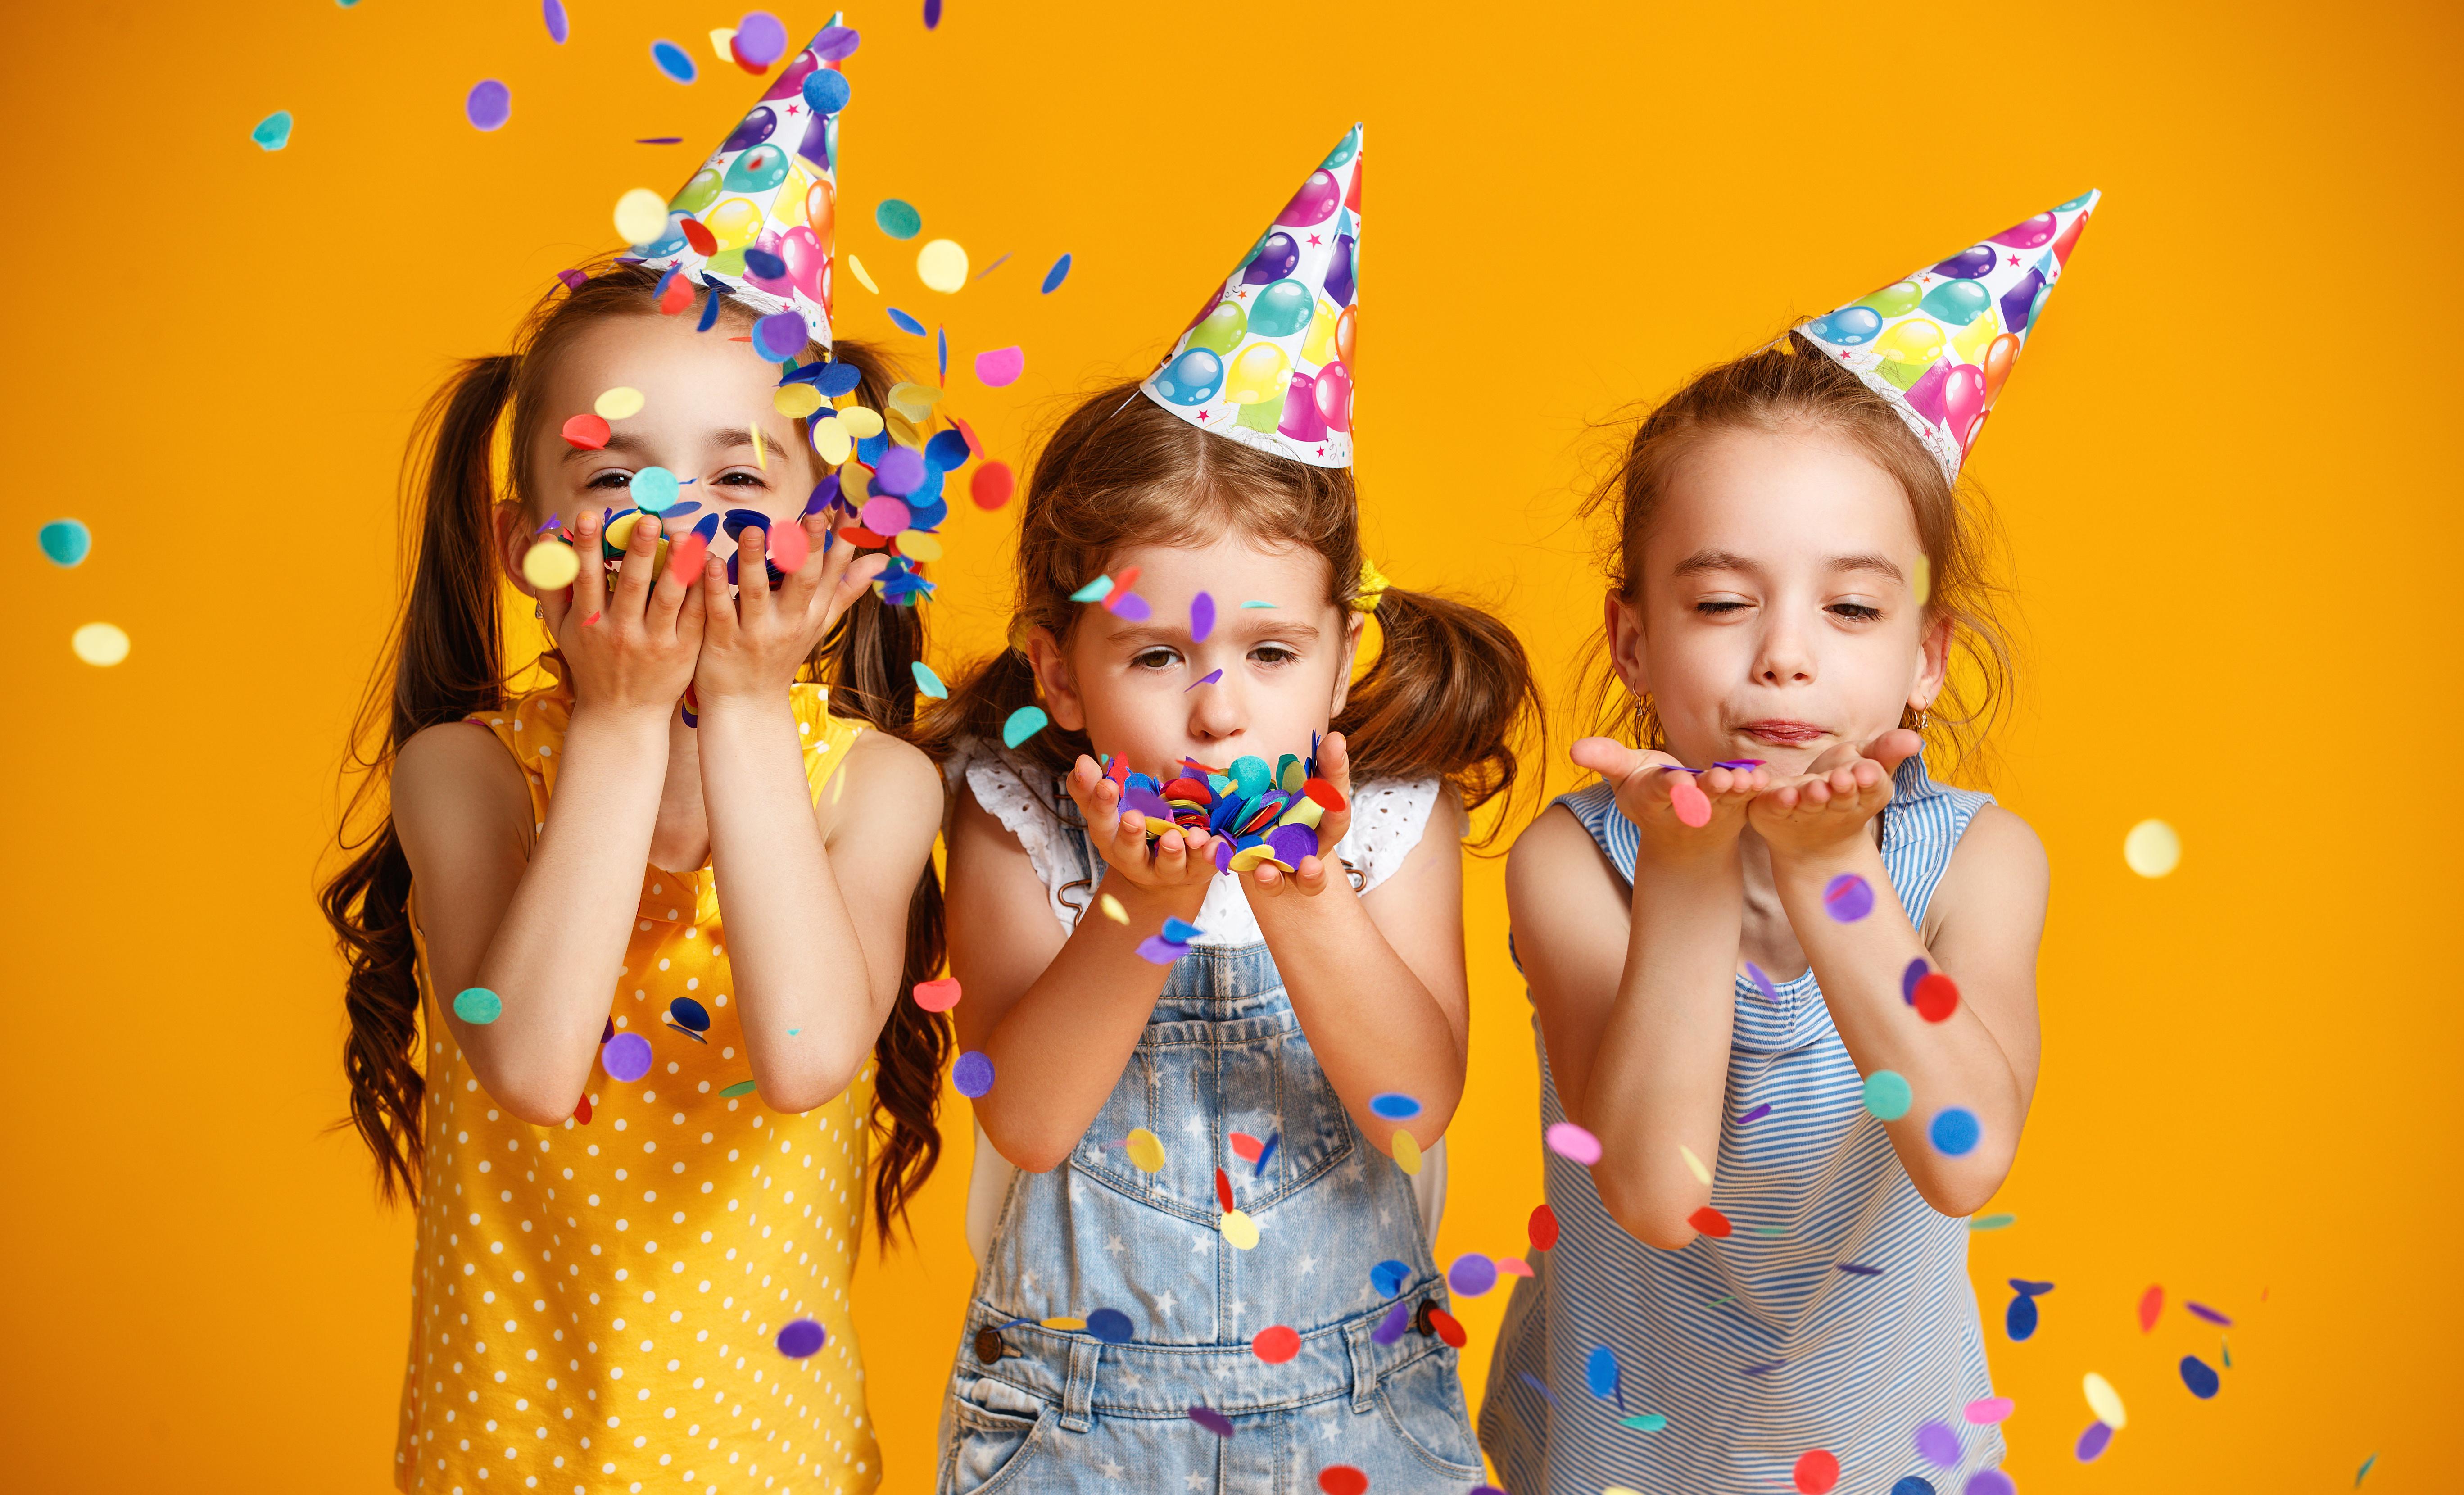 happy birthday children girls with confetti on yellow background